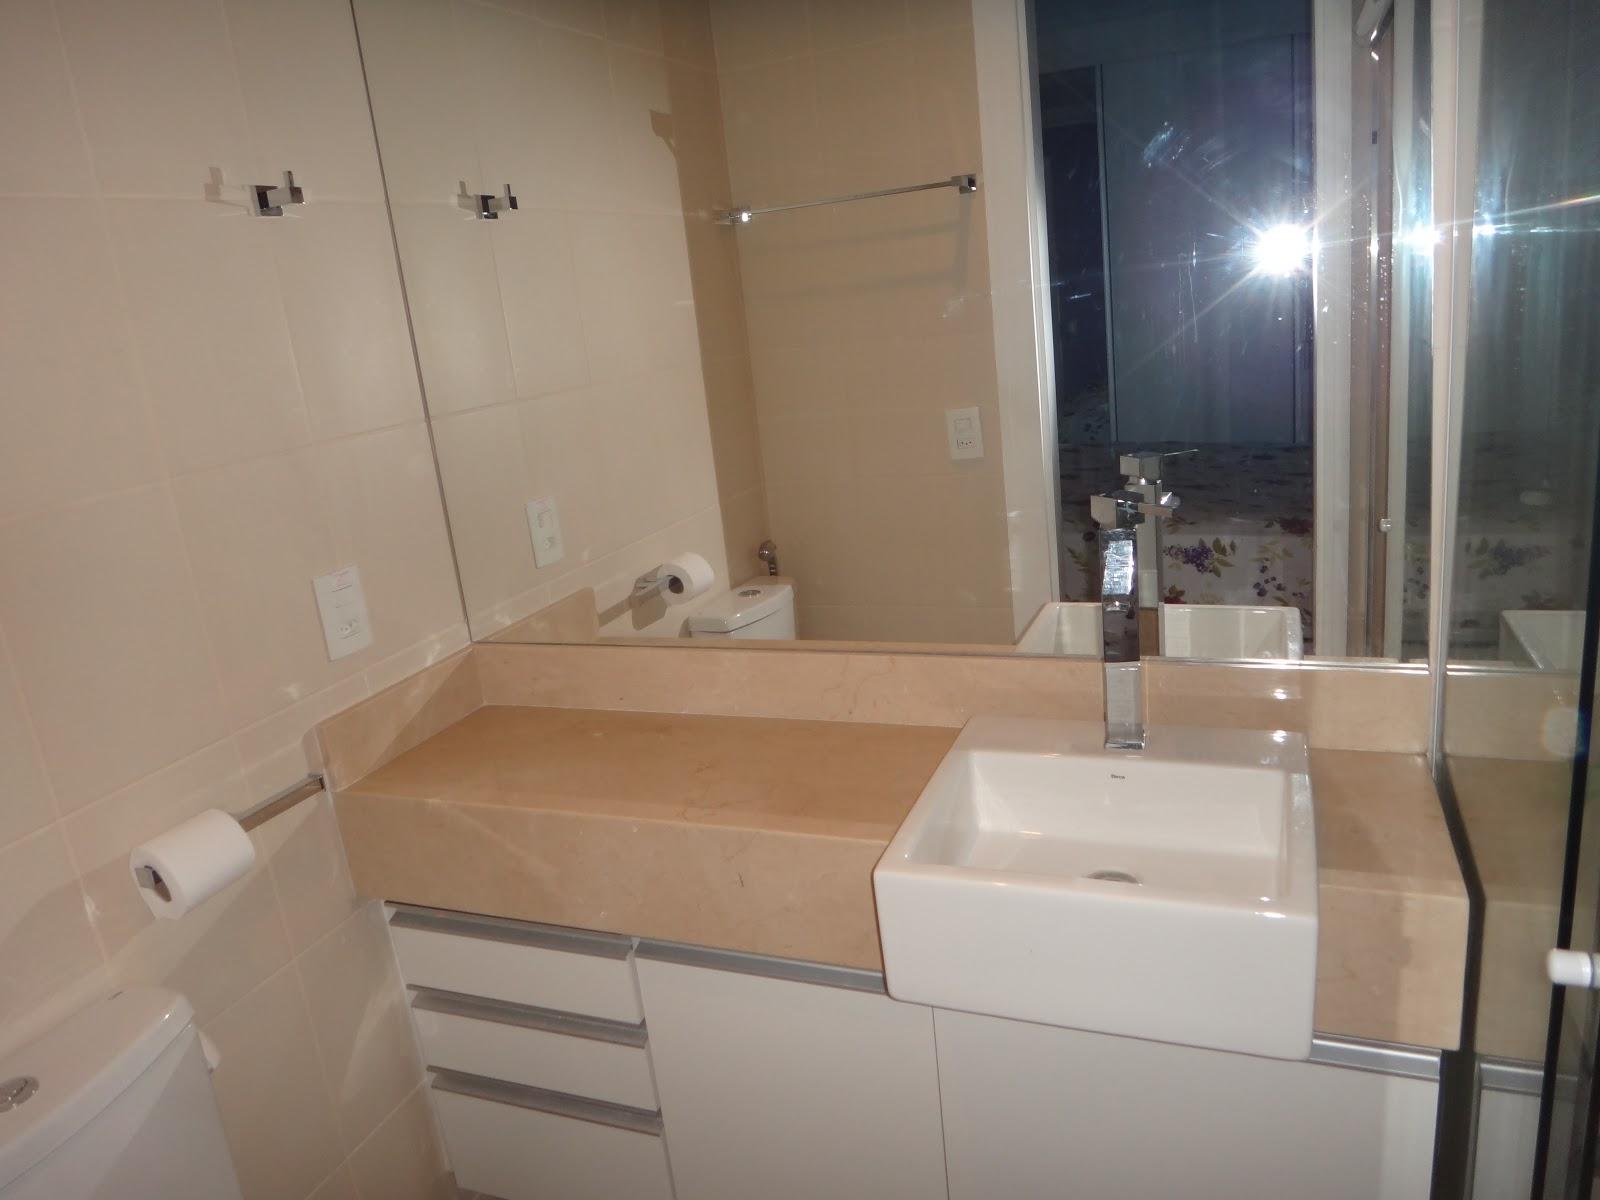 Condomínio Kawai * Freguesia*: Dezembro 2012 #7F654C 1600x1200 Armario Para Banheiro De Blindex